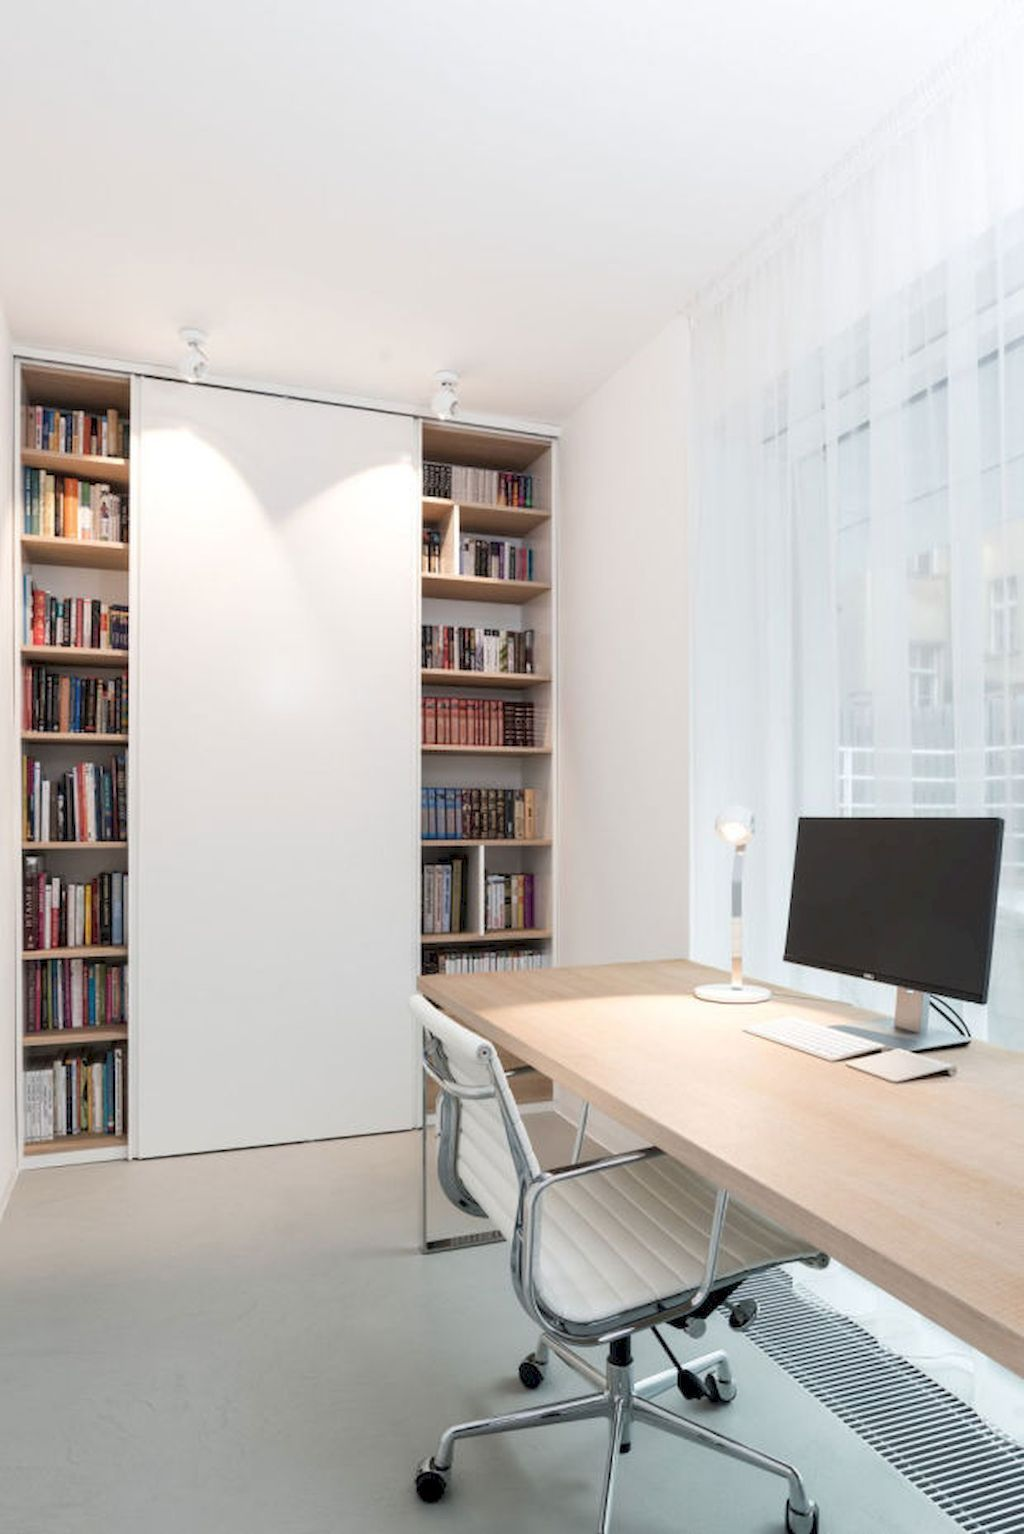 55 modern workspace design ideas small spaces 10 office rh pinterest com